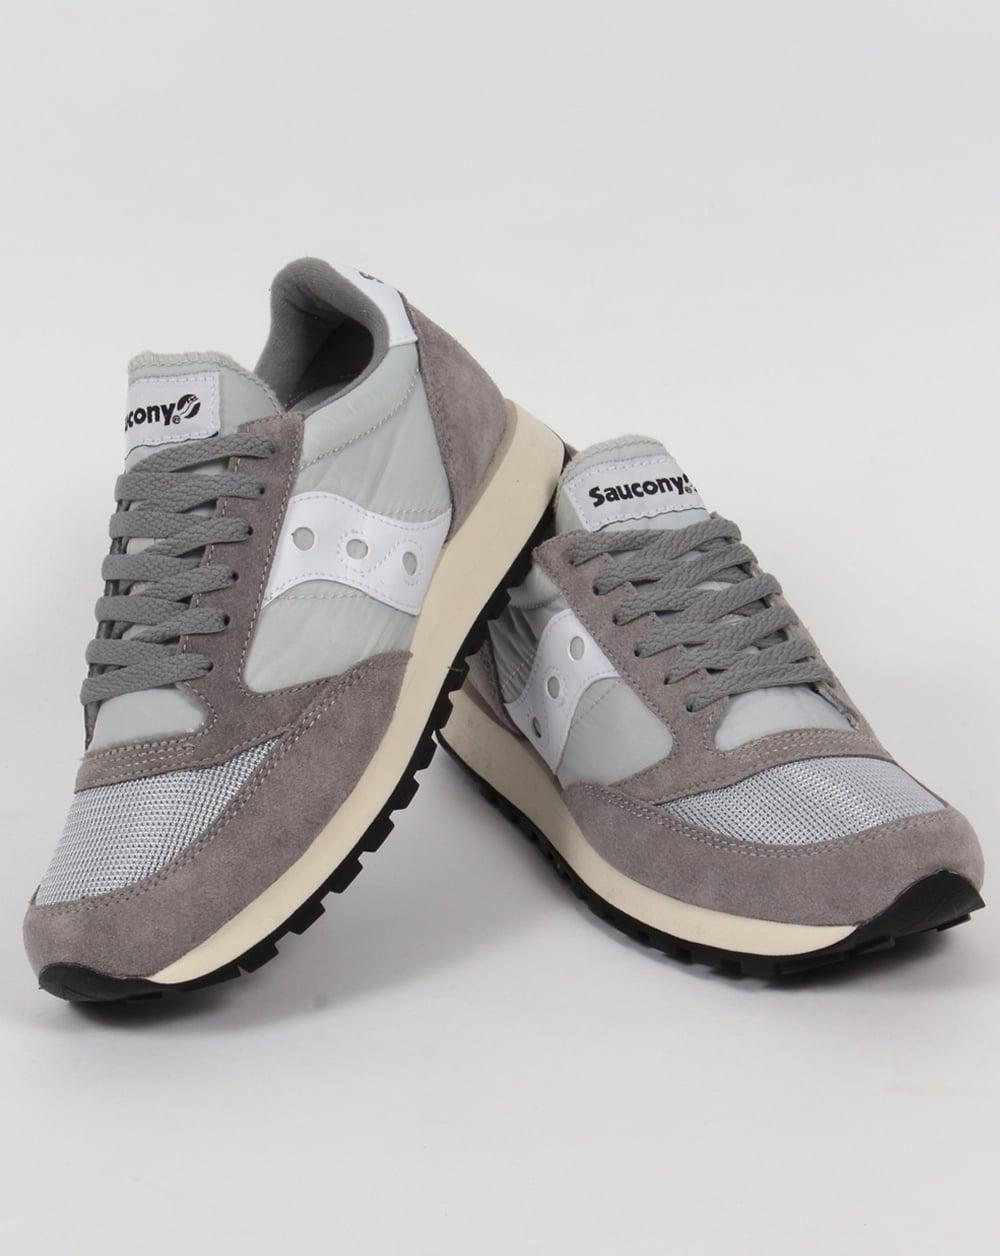 dcddc69c61db saucony originals men s trainer 80 fashion sneaker. saucony originals men s  trainer 80 fashion sneaker saucony jazz original vintage trainers grey white  ...